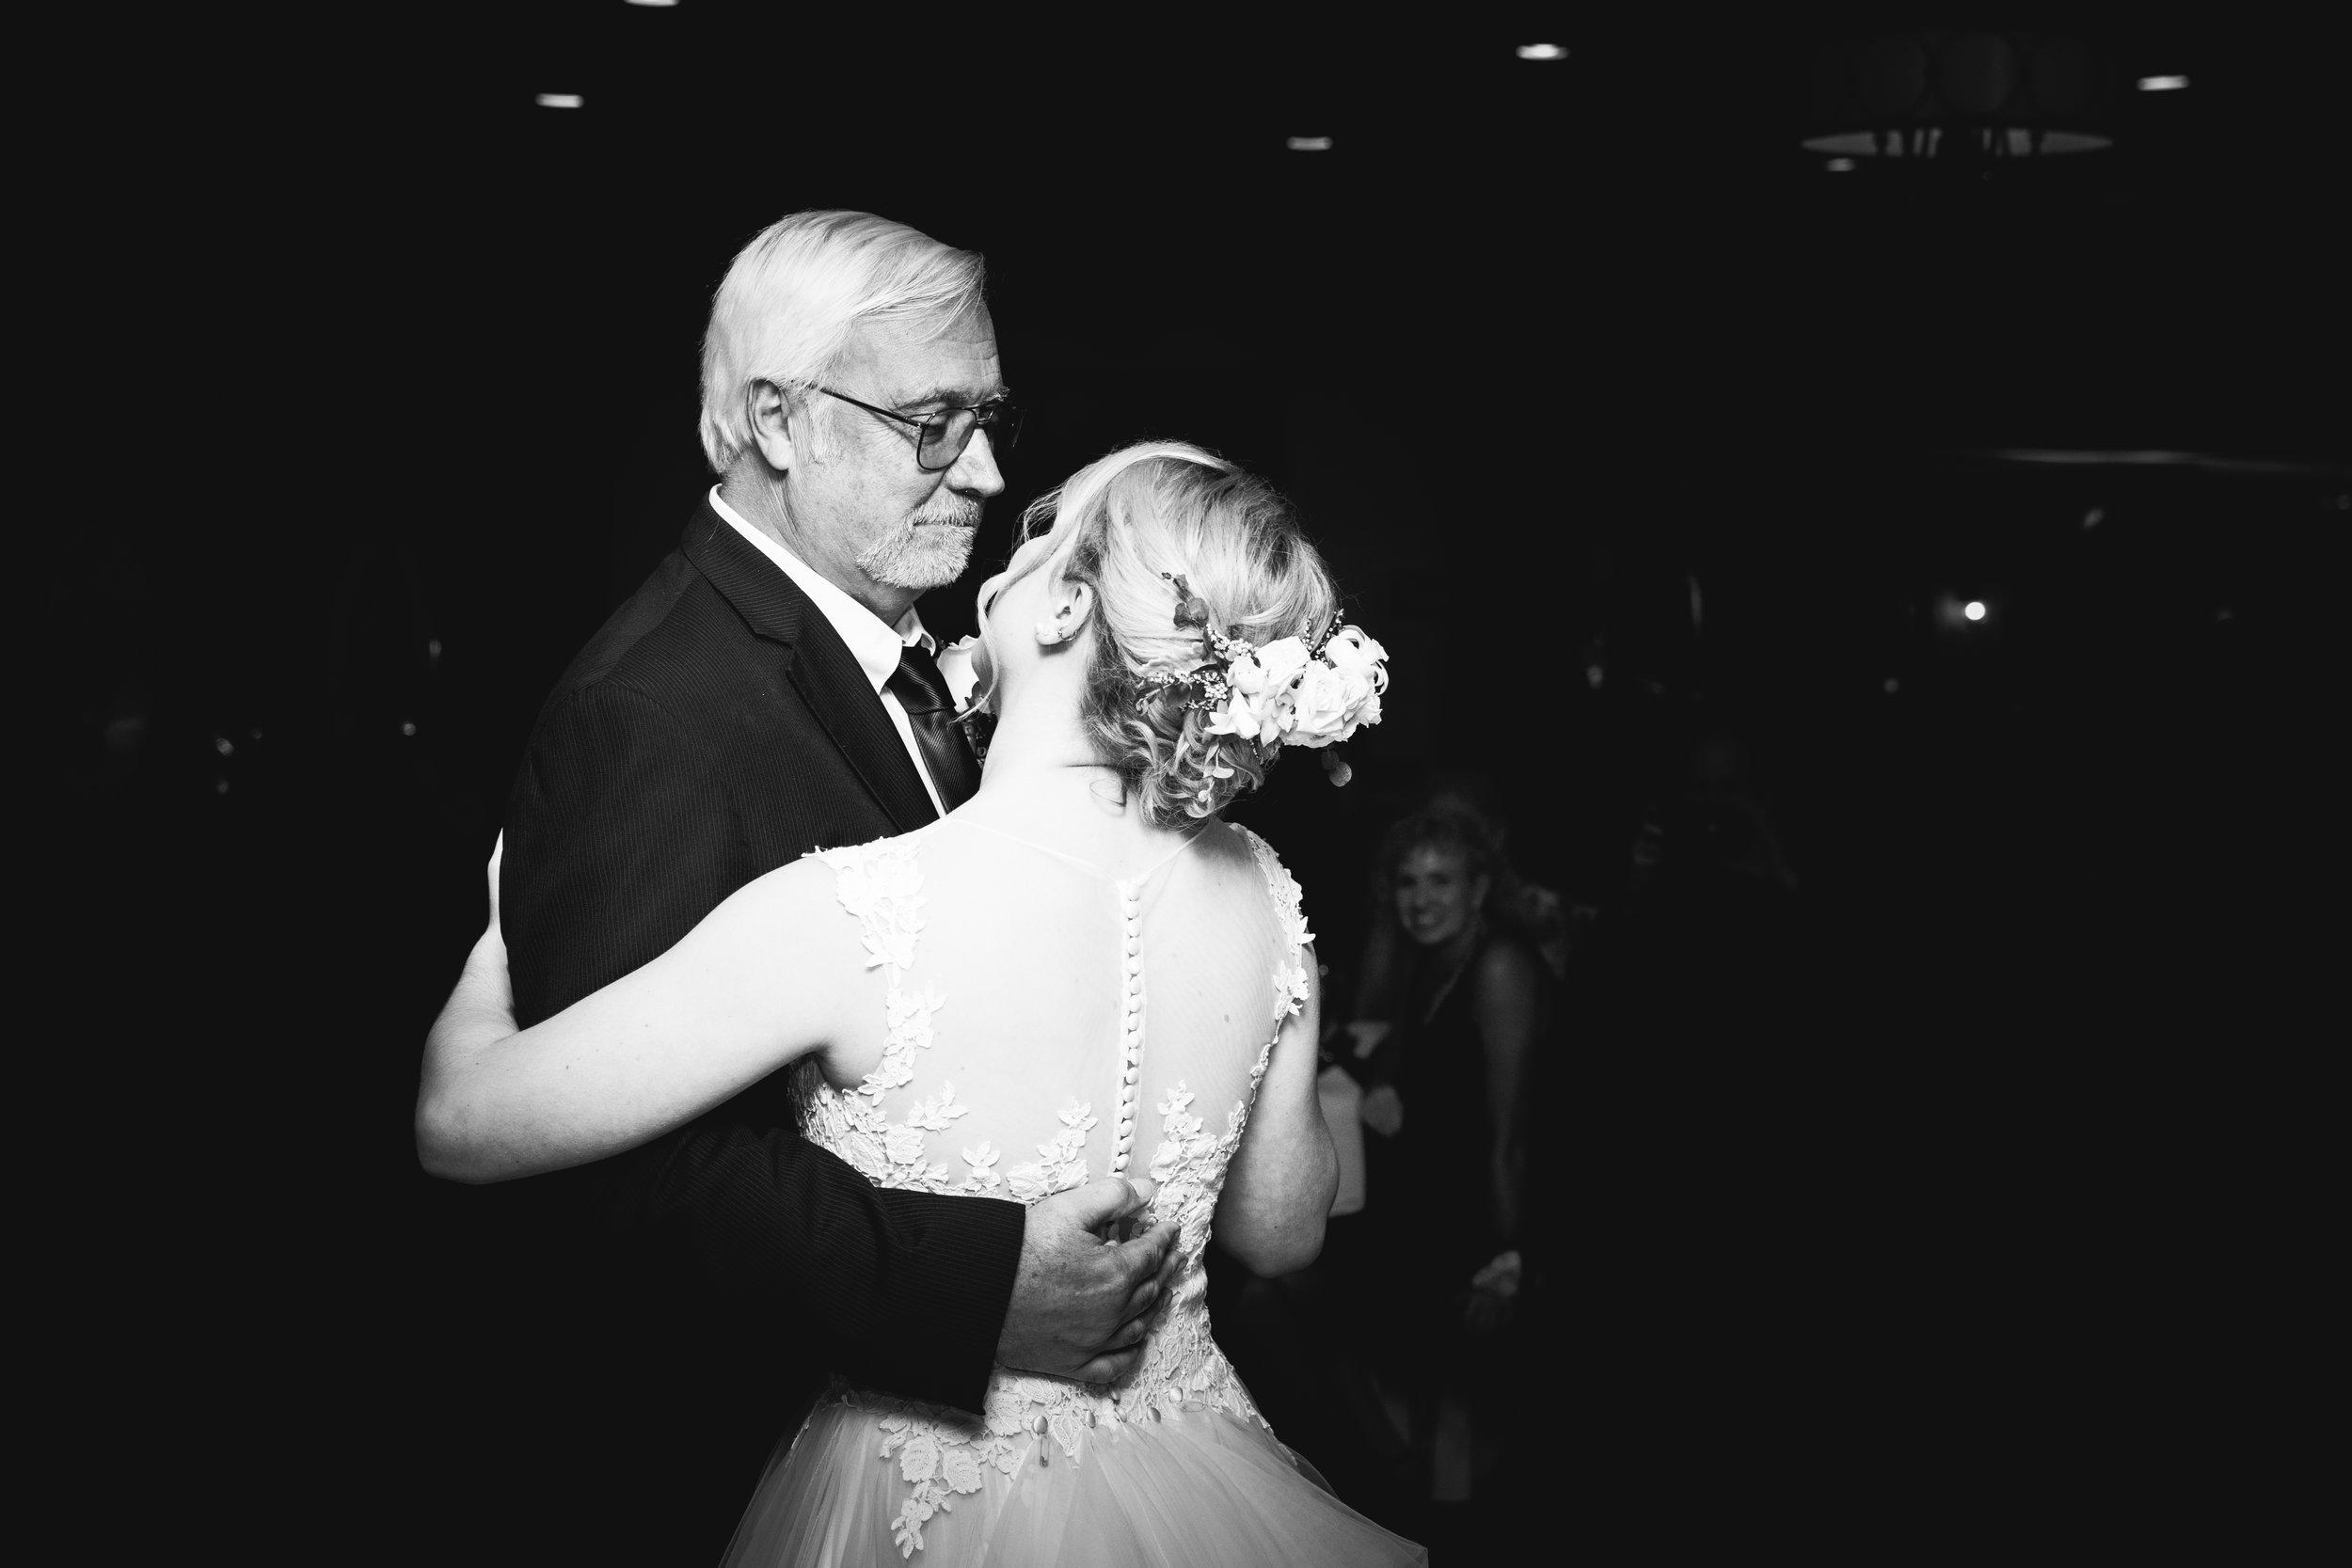 LA LUNA BANQUET HALL WEDDING BENSALEM - 100.jpg